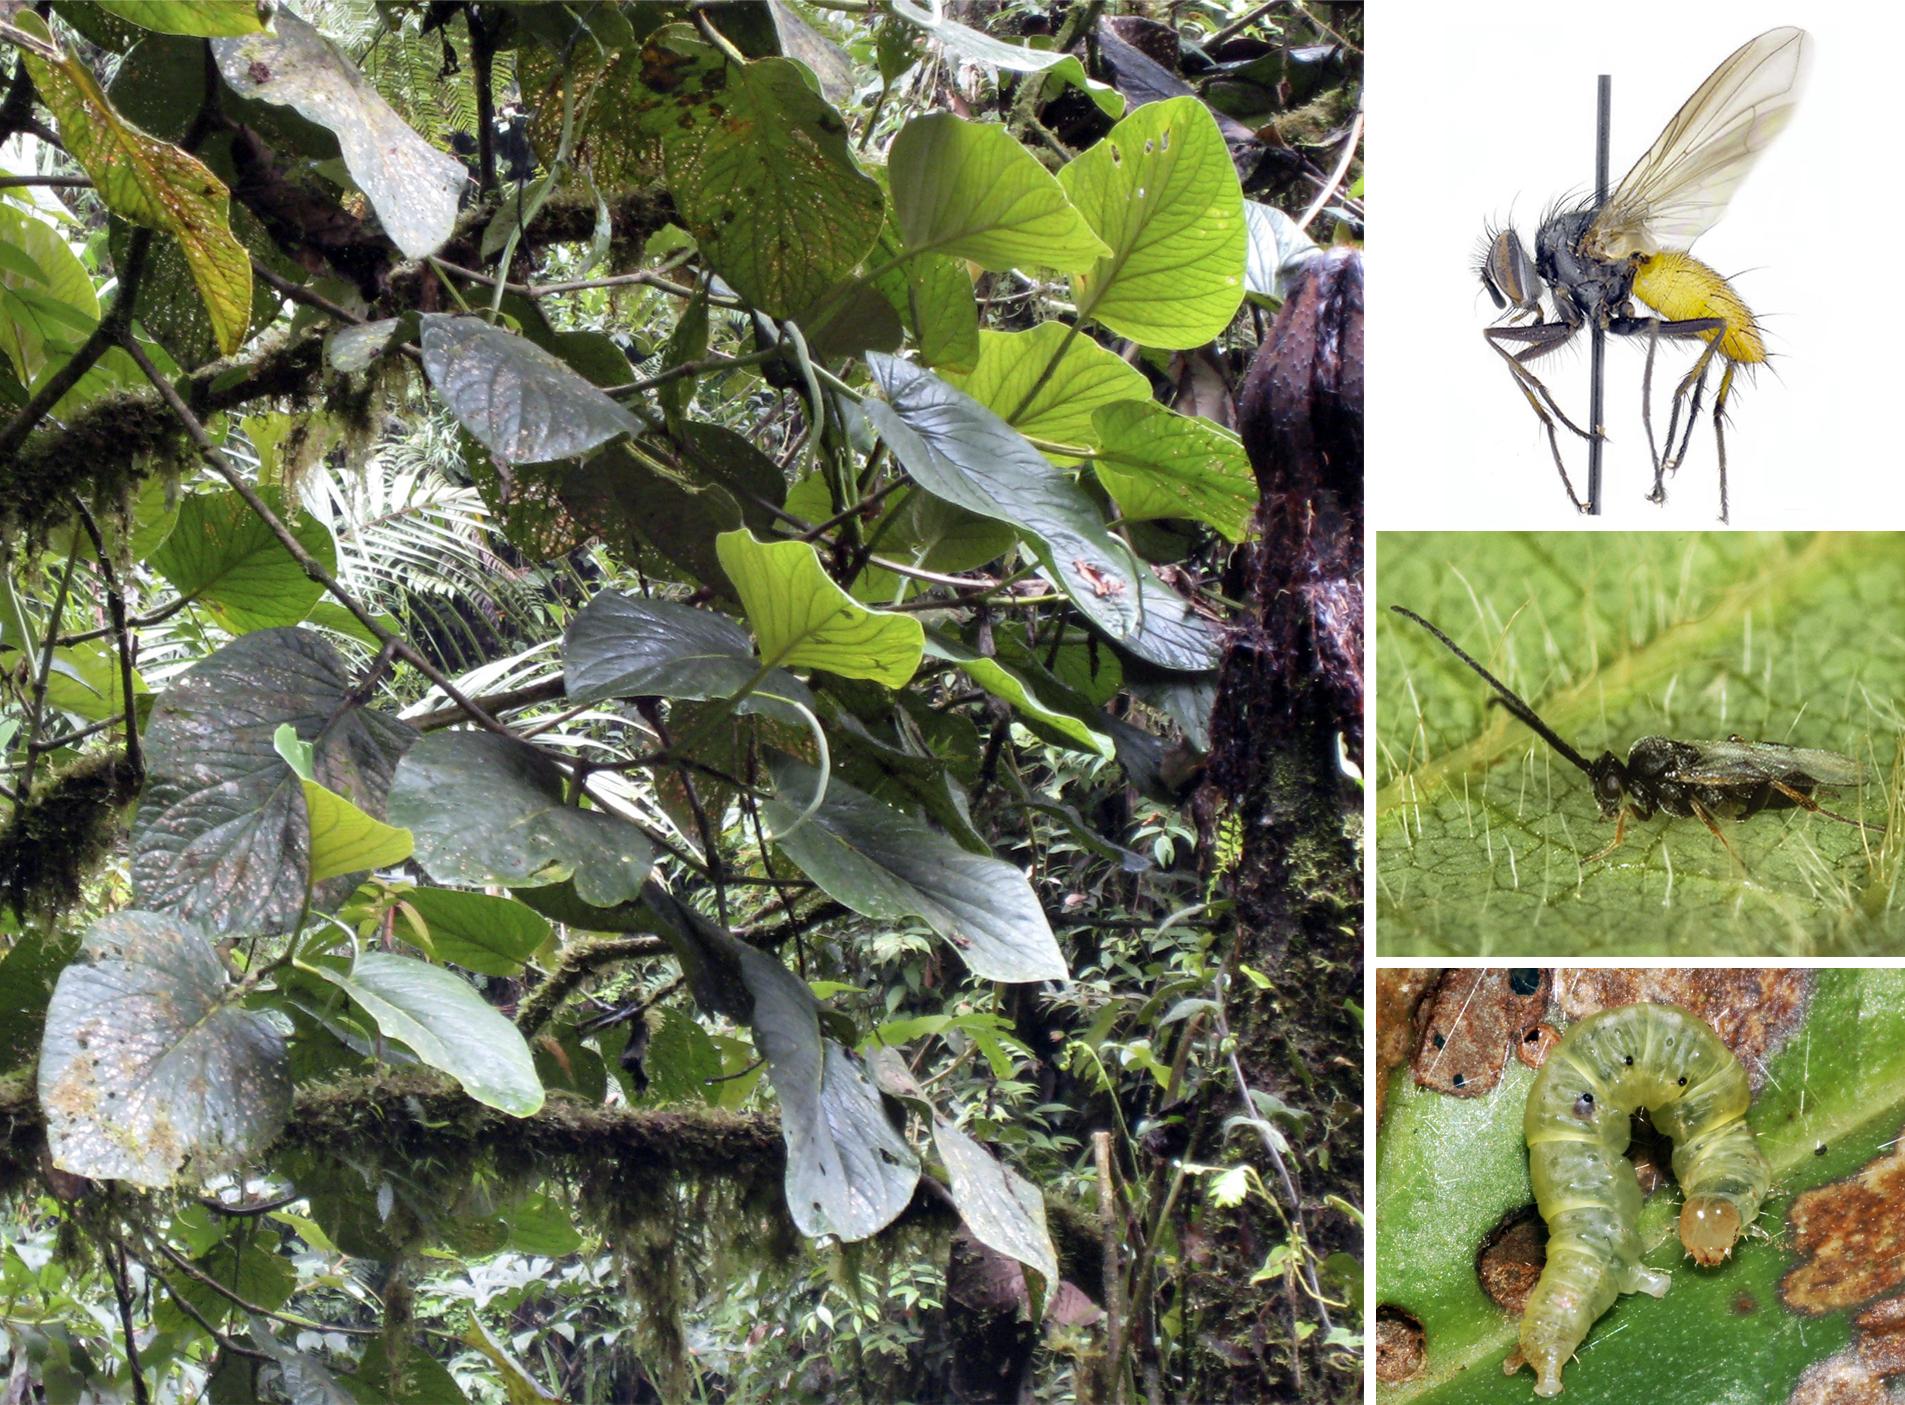 New Plant Species A Microcosm Of Biodiversity